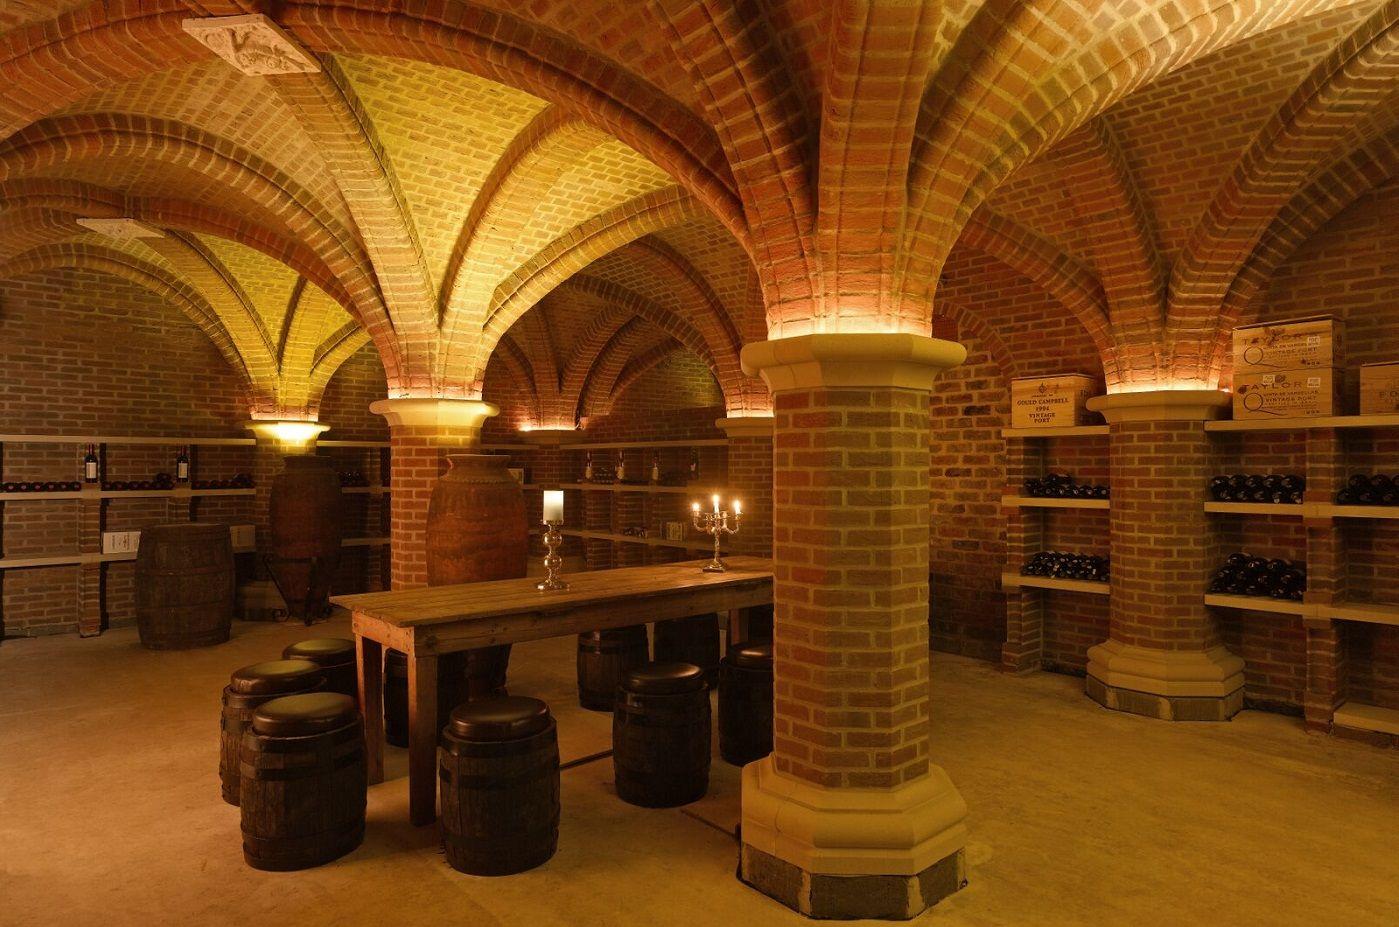 The Stunning Tupgill Cellar At Leyburn Crafted From York Handmade Bricks Weinkeller Weinkeller Keller Gewölbekeller